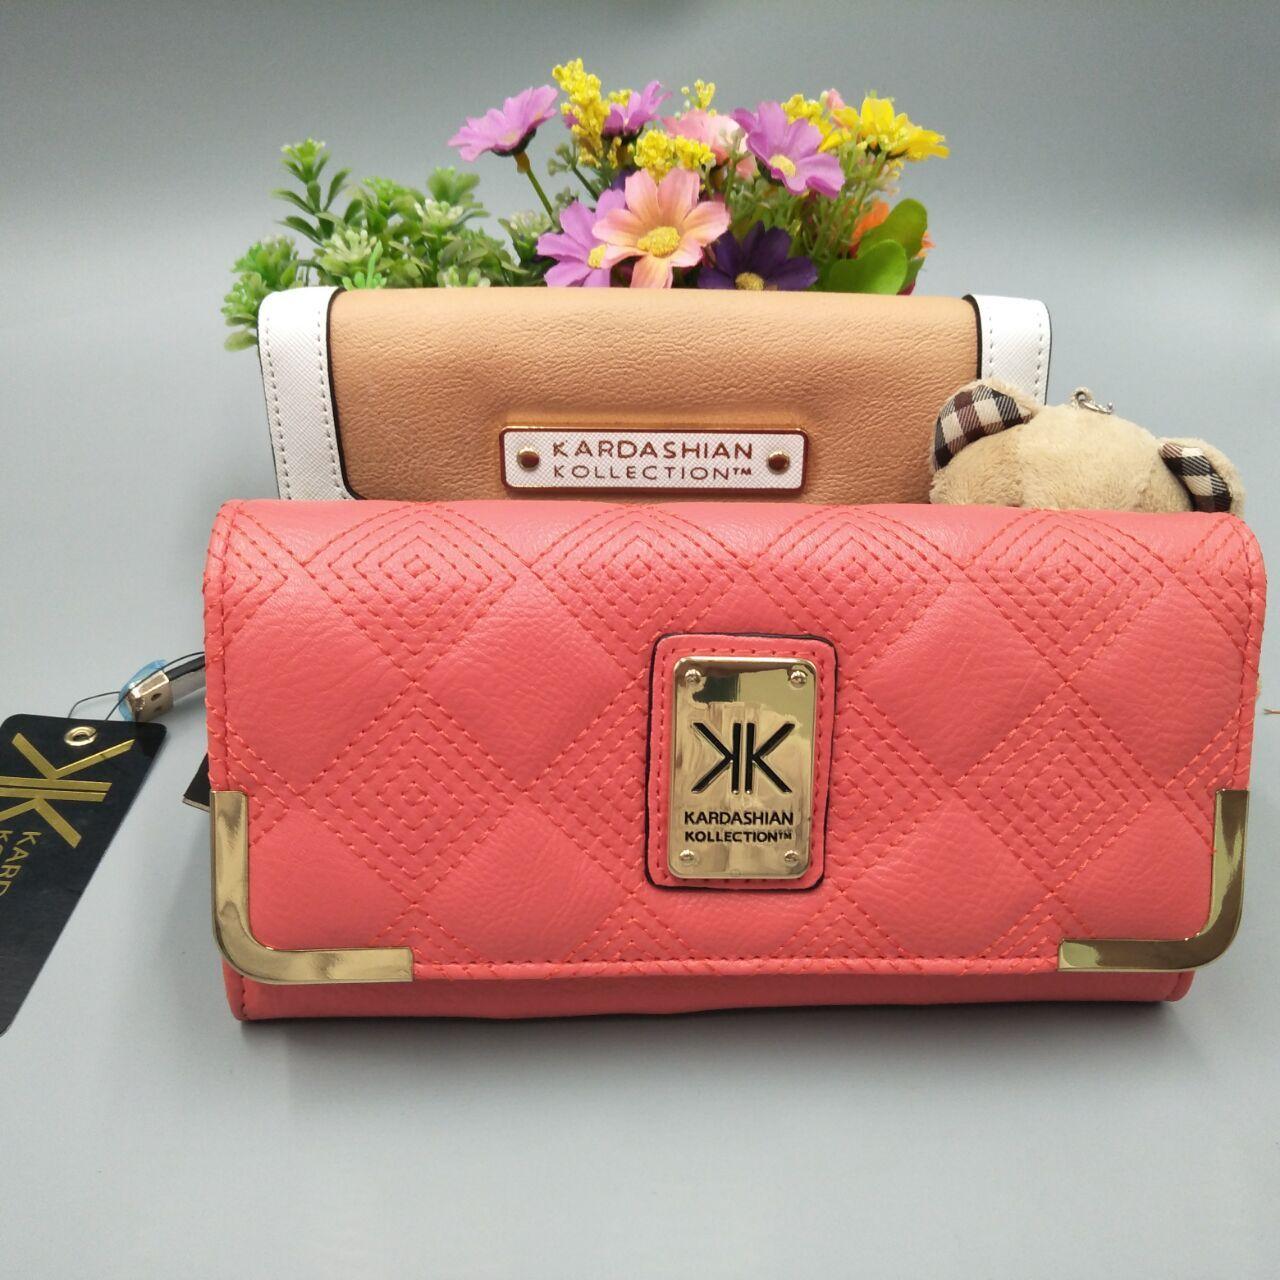 0570c52570 Big Capacity Elegant Women Wallet Long 2018 Large Capacity Long Zipper  Solid Women Phone Money Case Bag Coin Purse Card Ladies Clutch Leather  Goods Designer ...